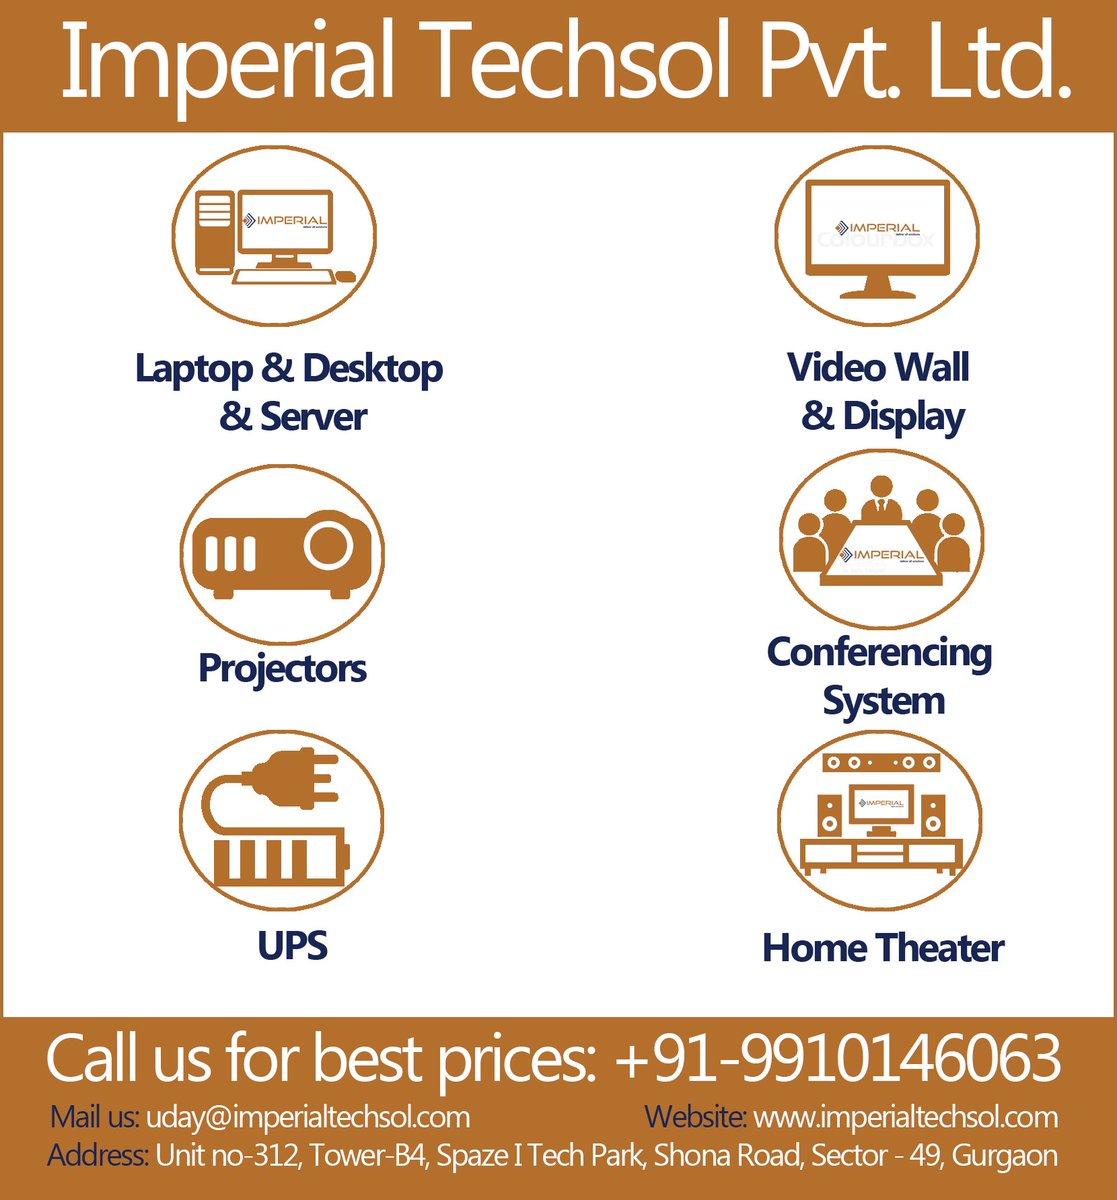 Imperial Techsol Pvt  Ltd  on Twitter: